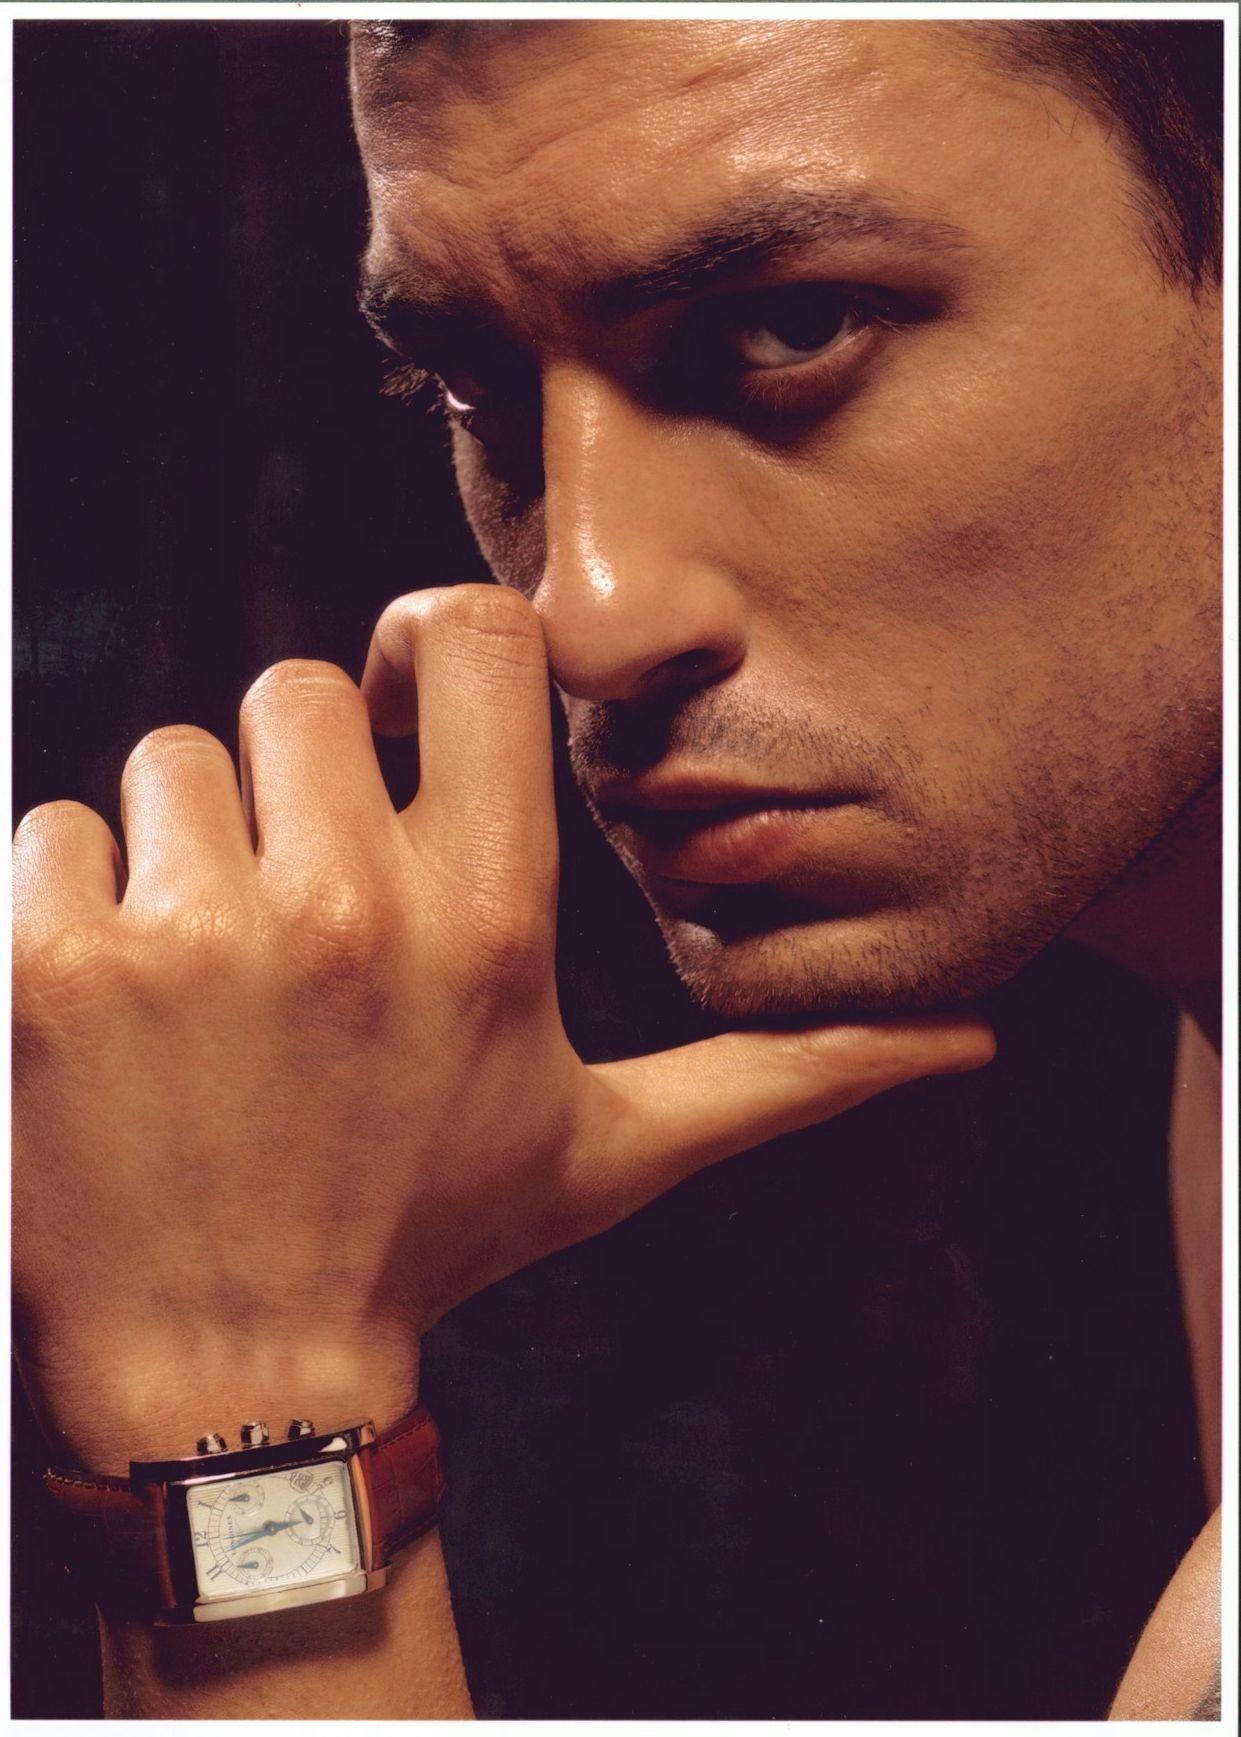 Playboy - 2004 - VladimirKaramazov | Portrait tattoo